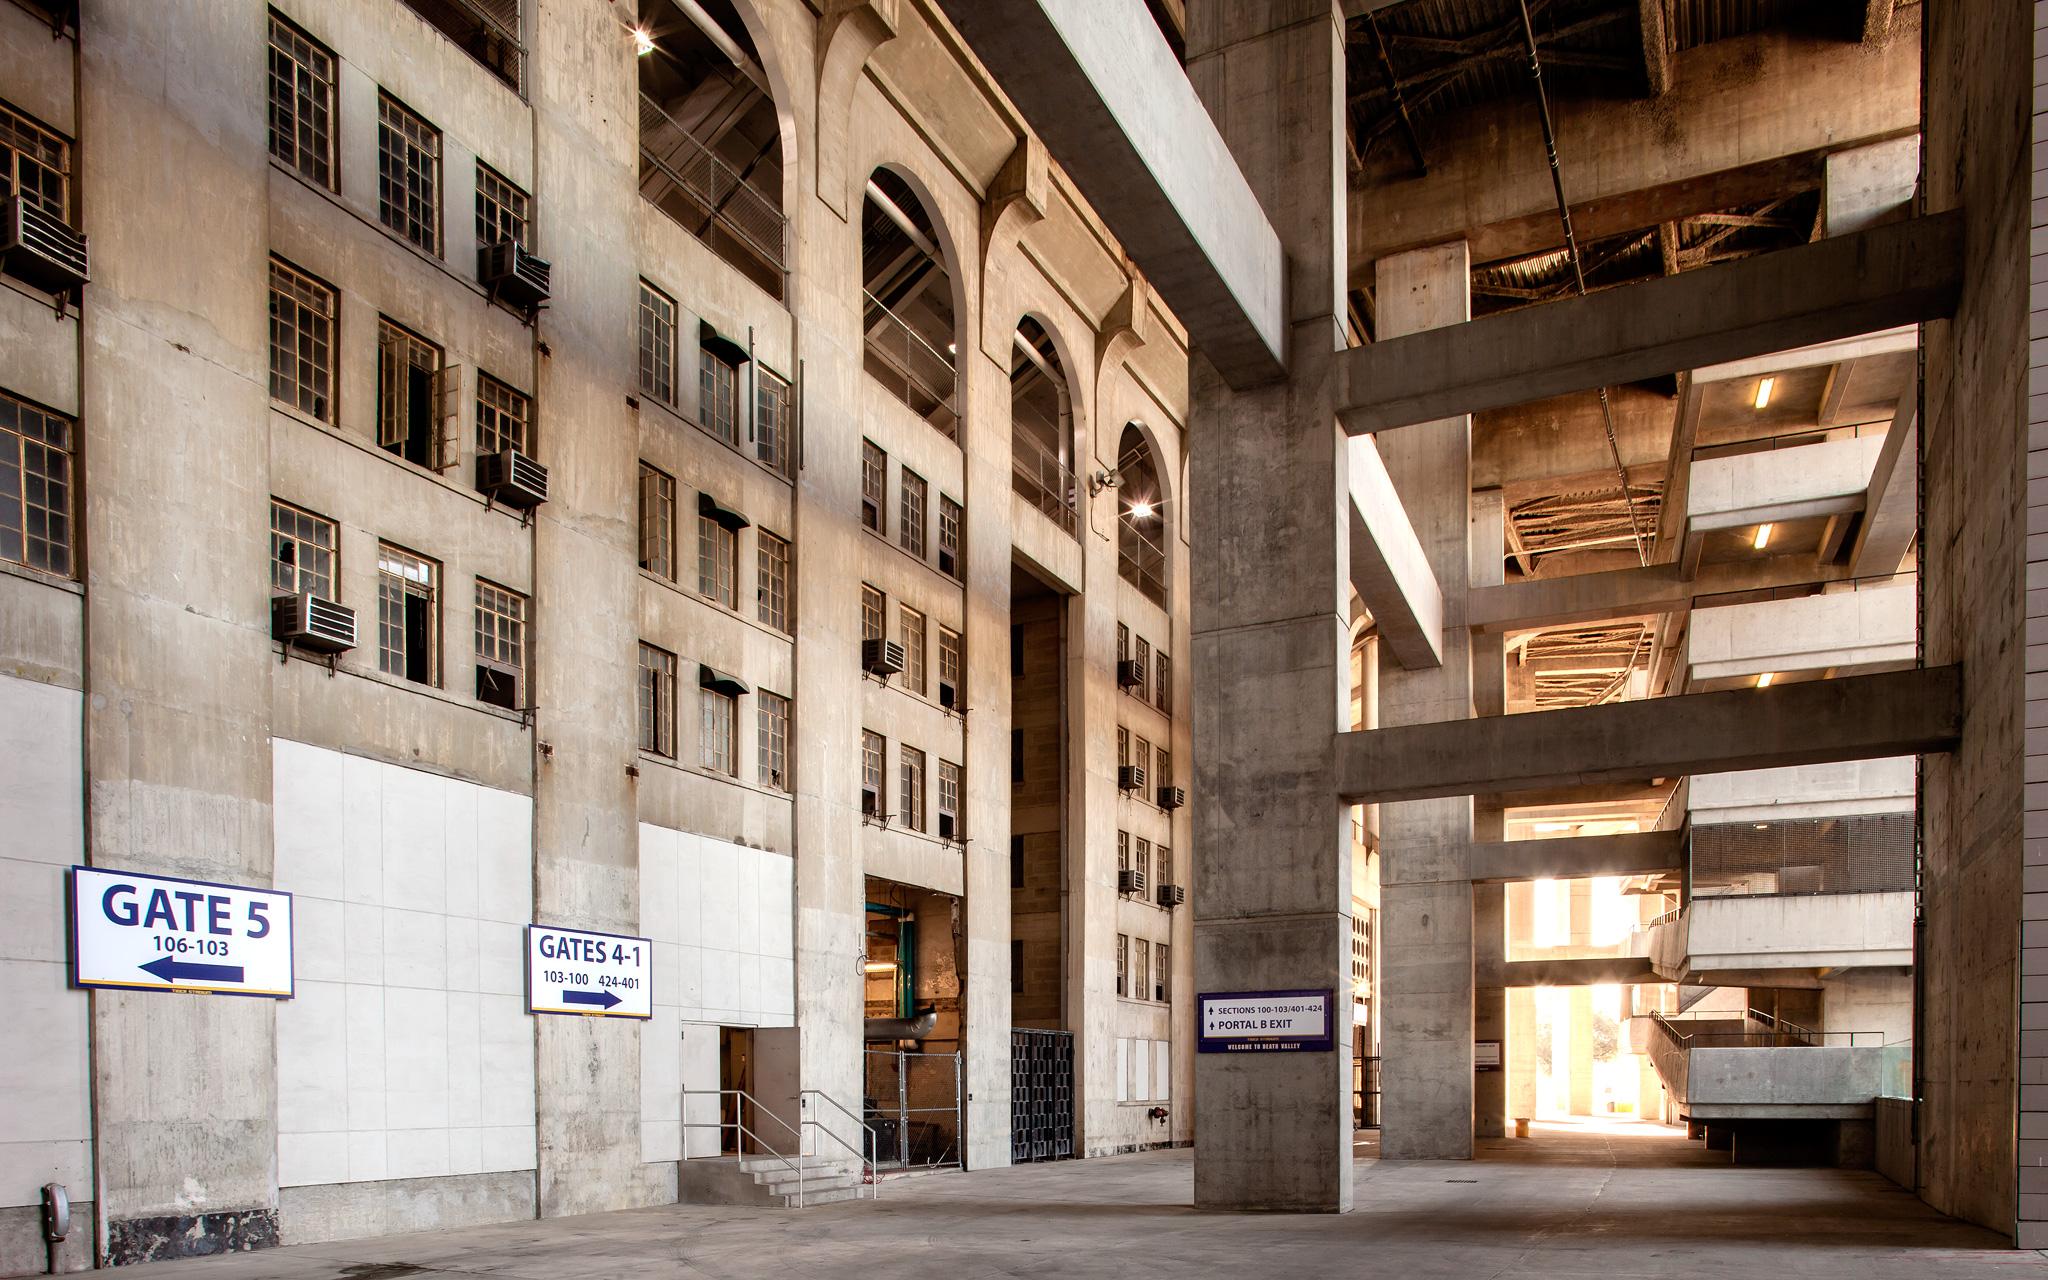 Old dorms in a exterior concourse Tiger Stadium